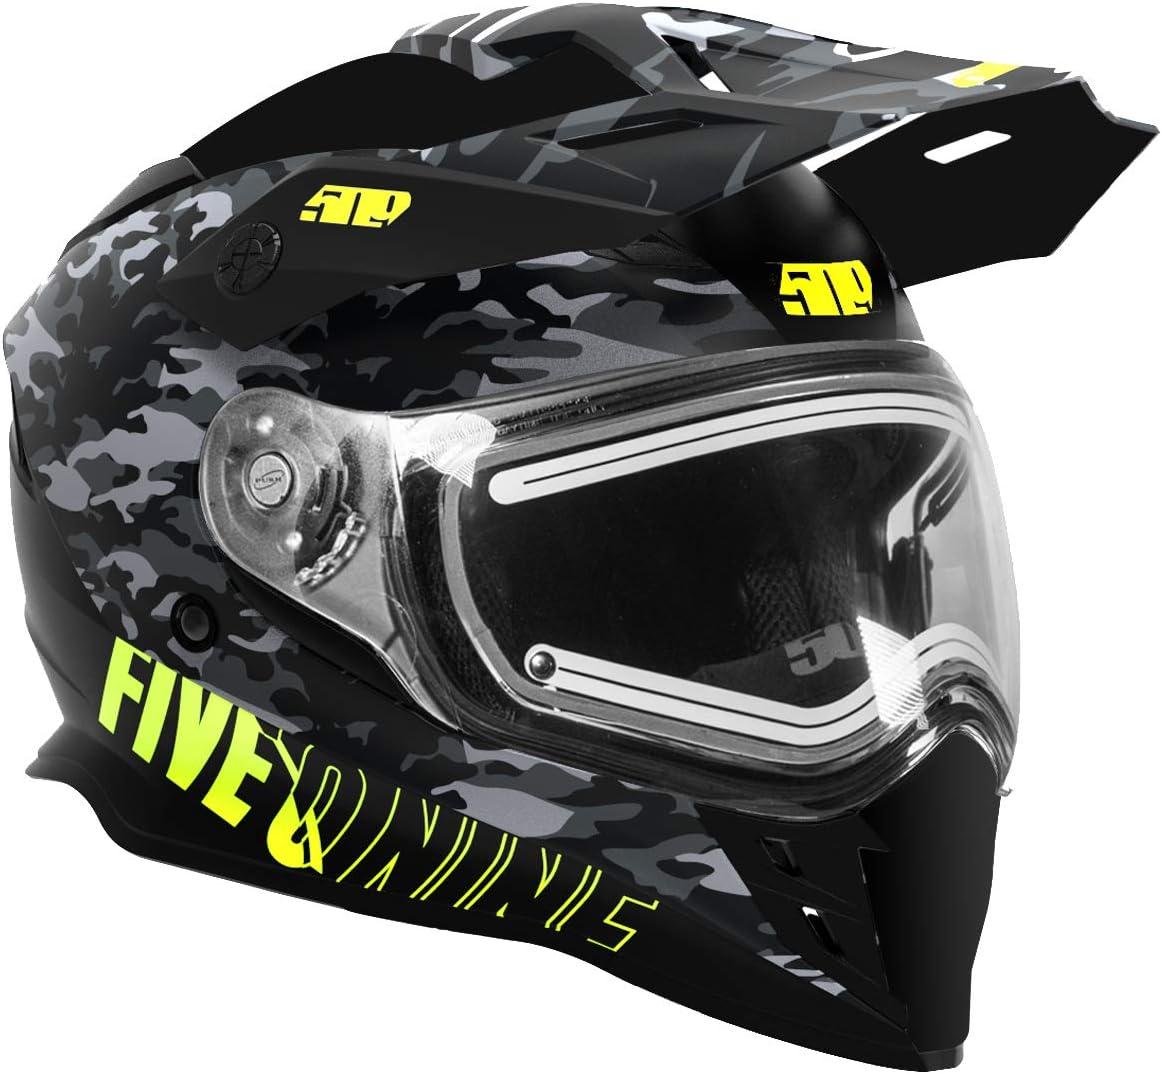 509 Delta R3点火头盔